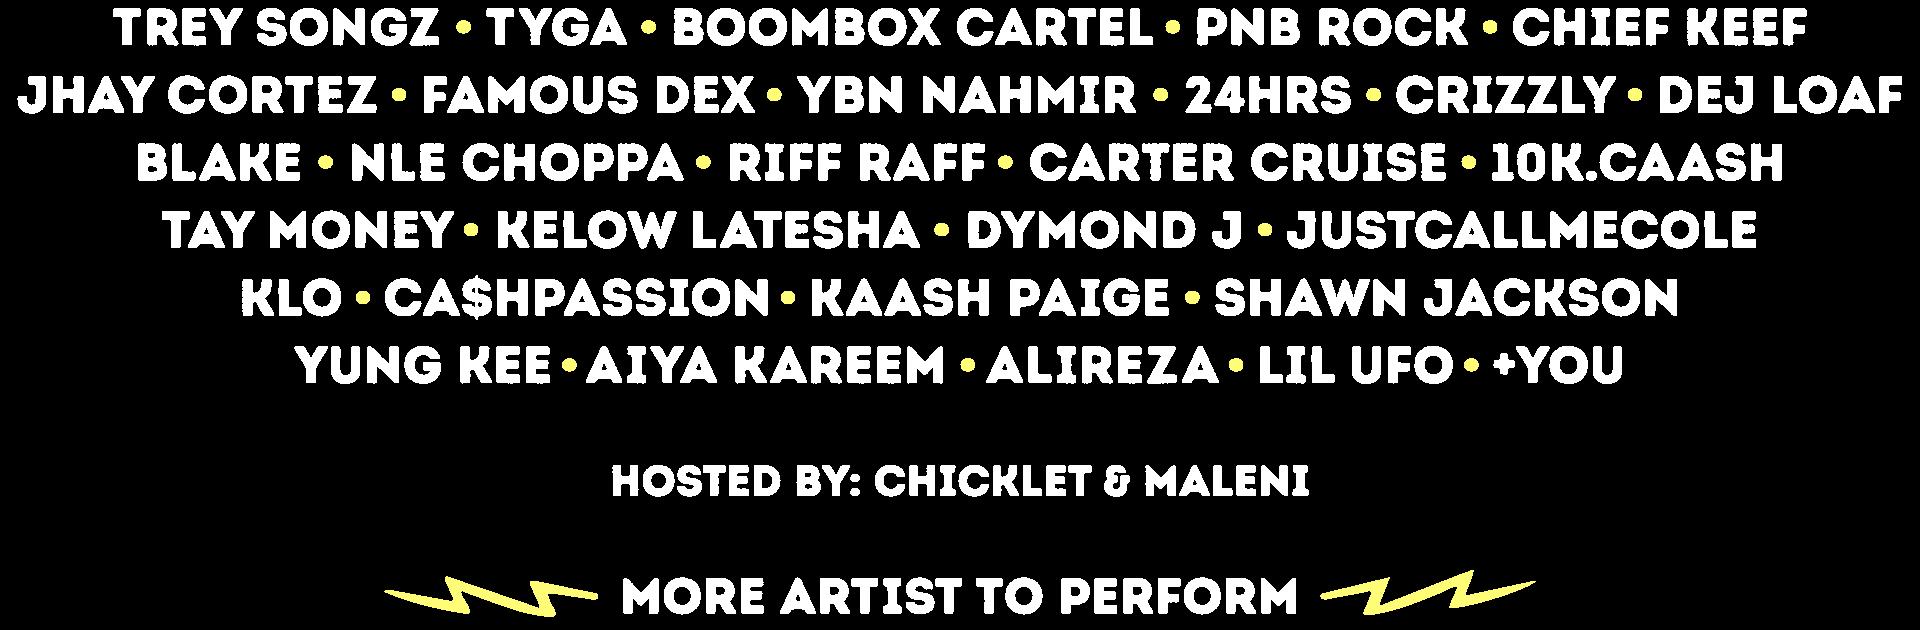 2019 Lineup includes Trey Songz, Tyga, Boombox Cartel, PnB Rock, Chief Keef